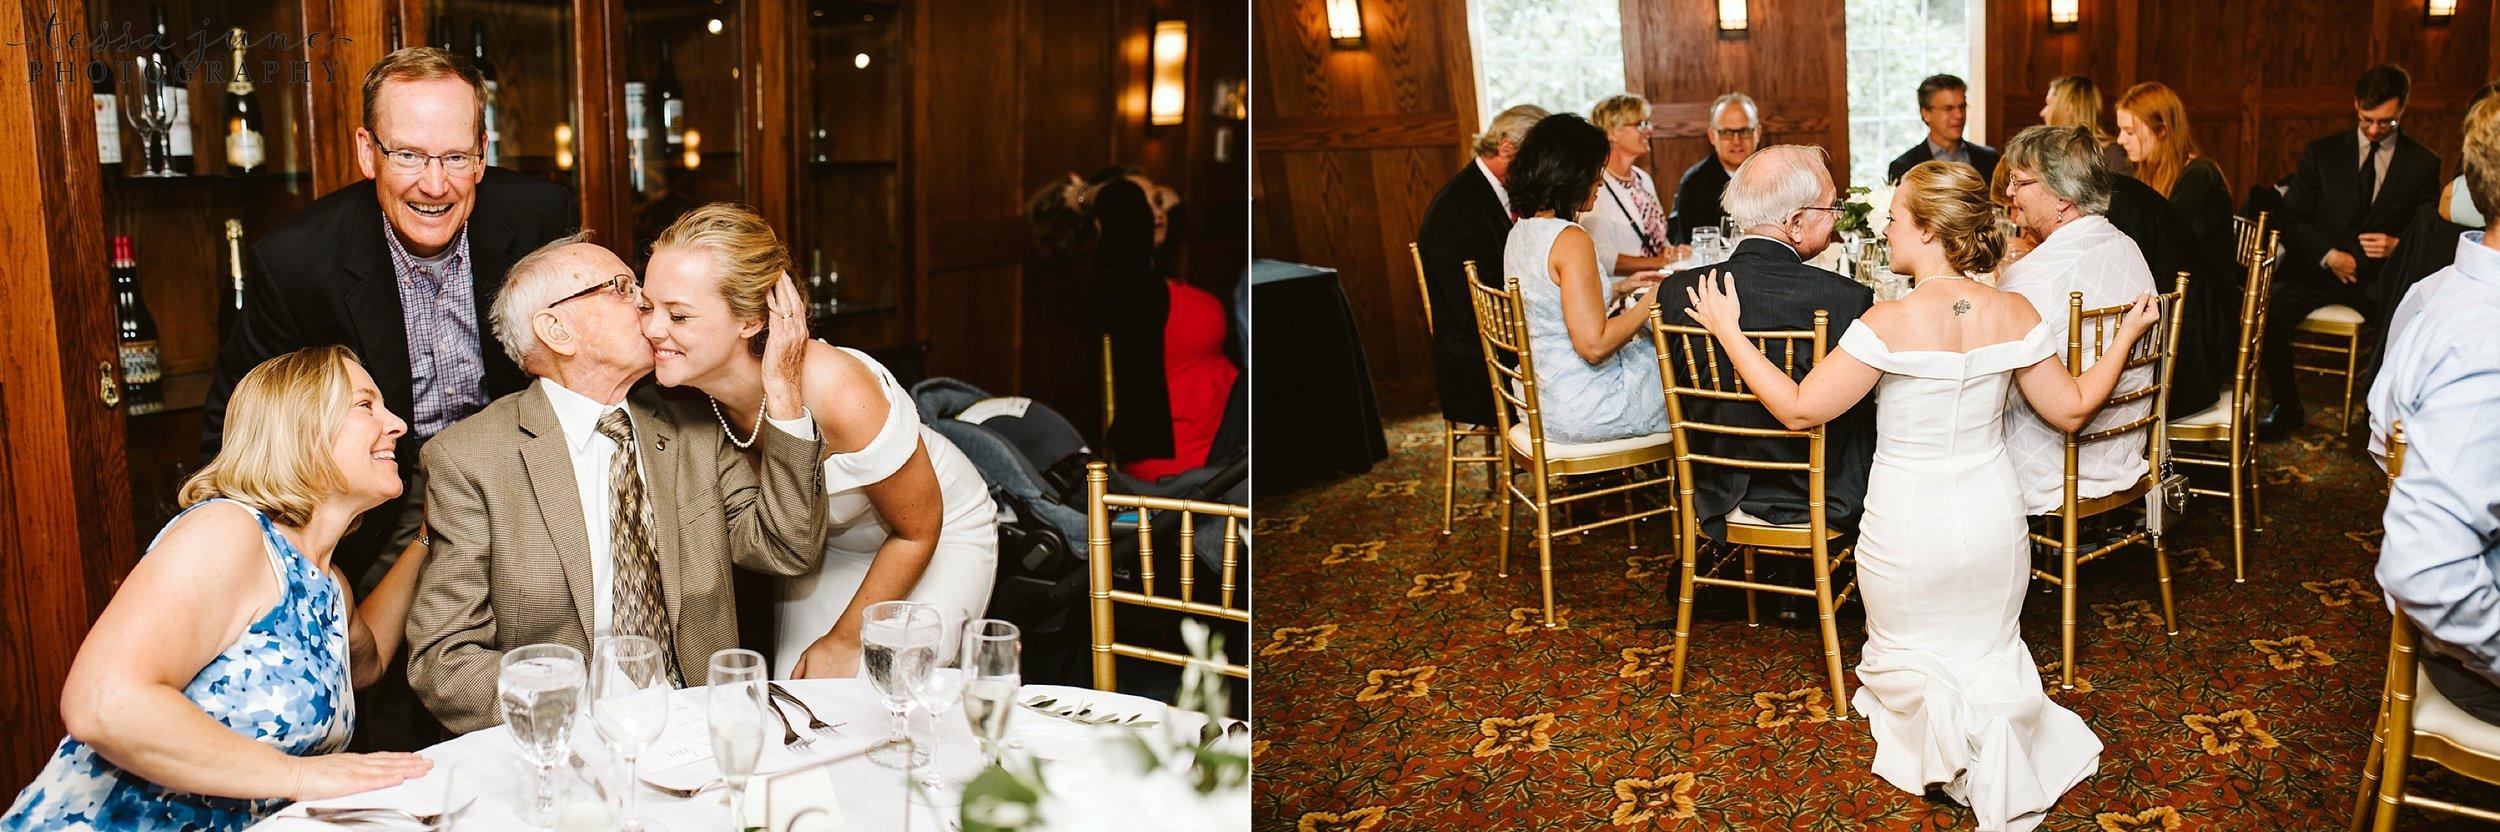 grandview-lodge-intimate-wedding-nisswa-minnesota_0094.jpg